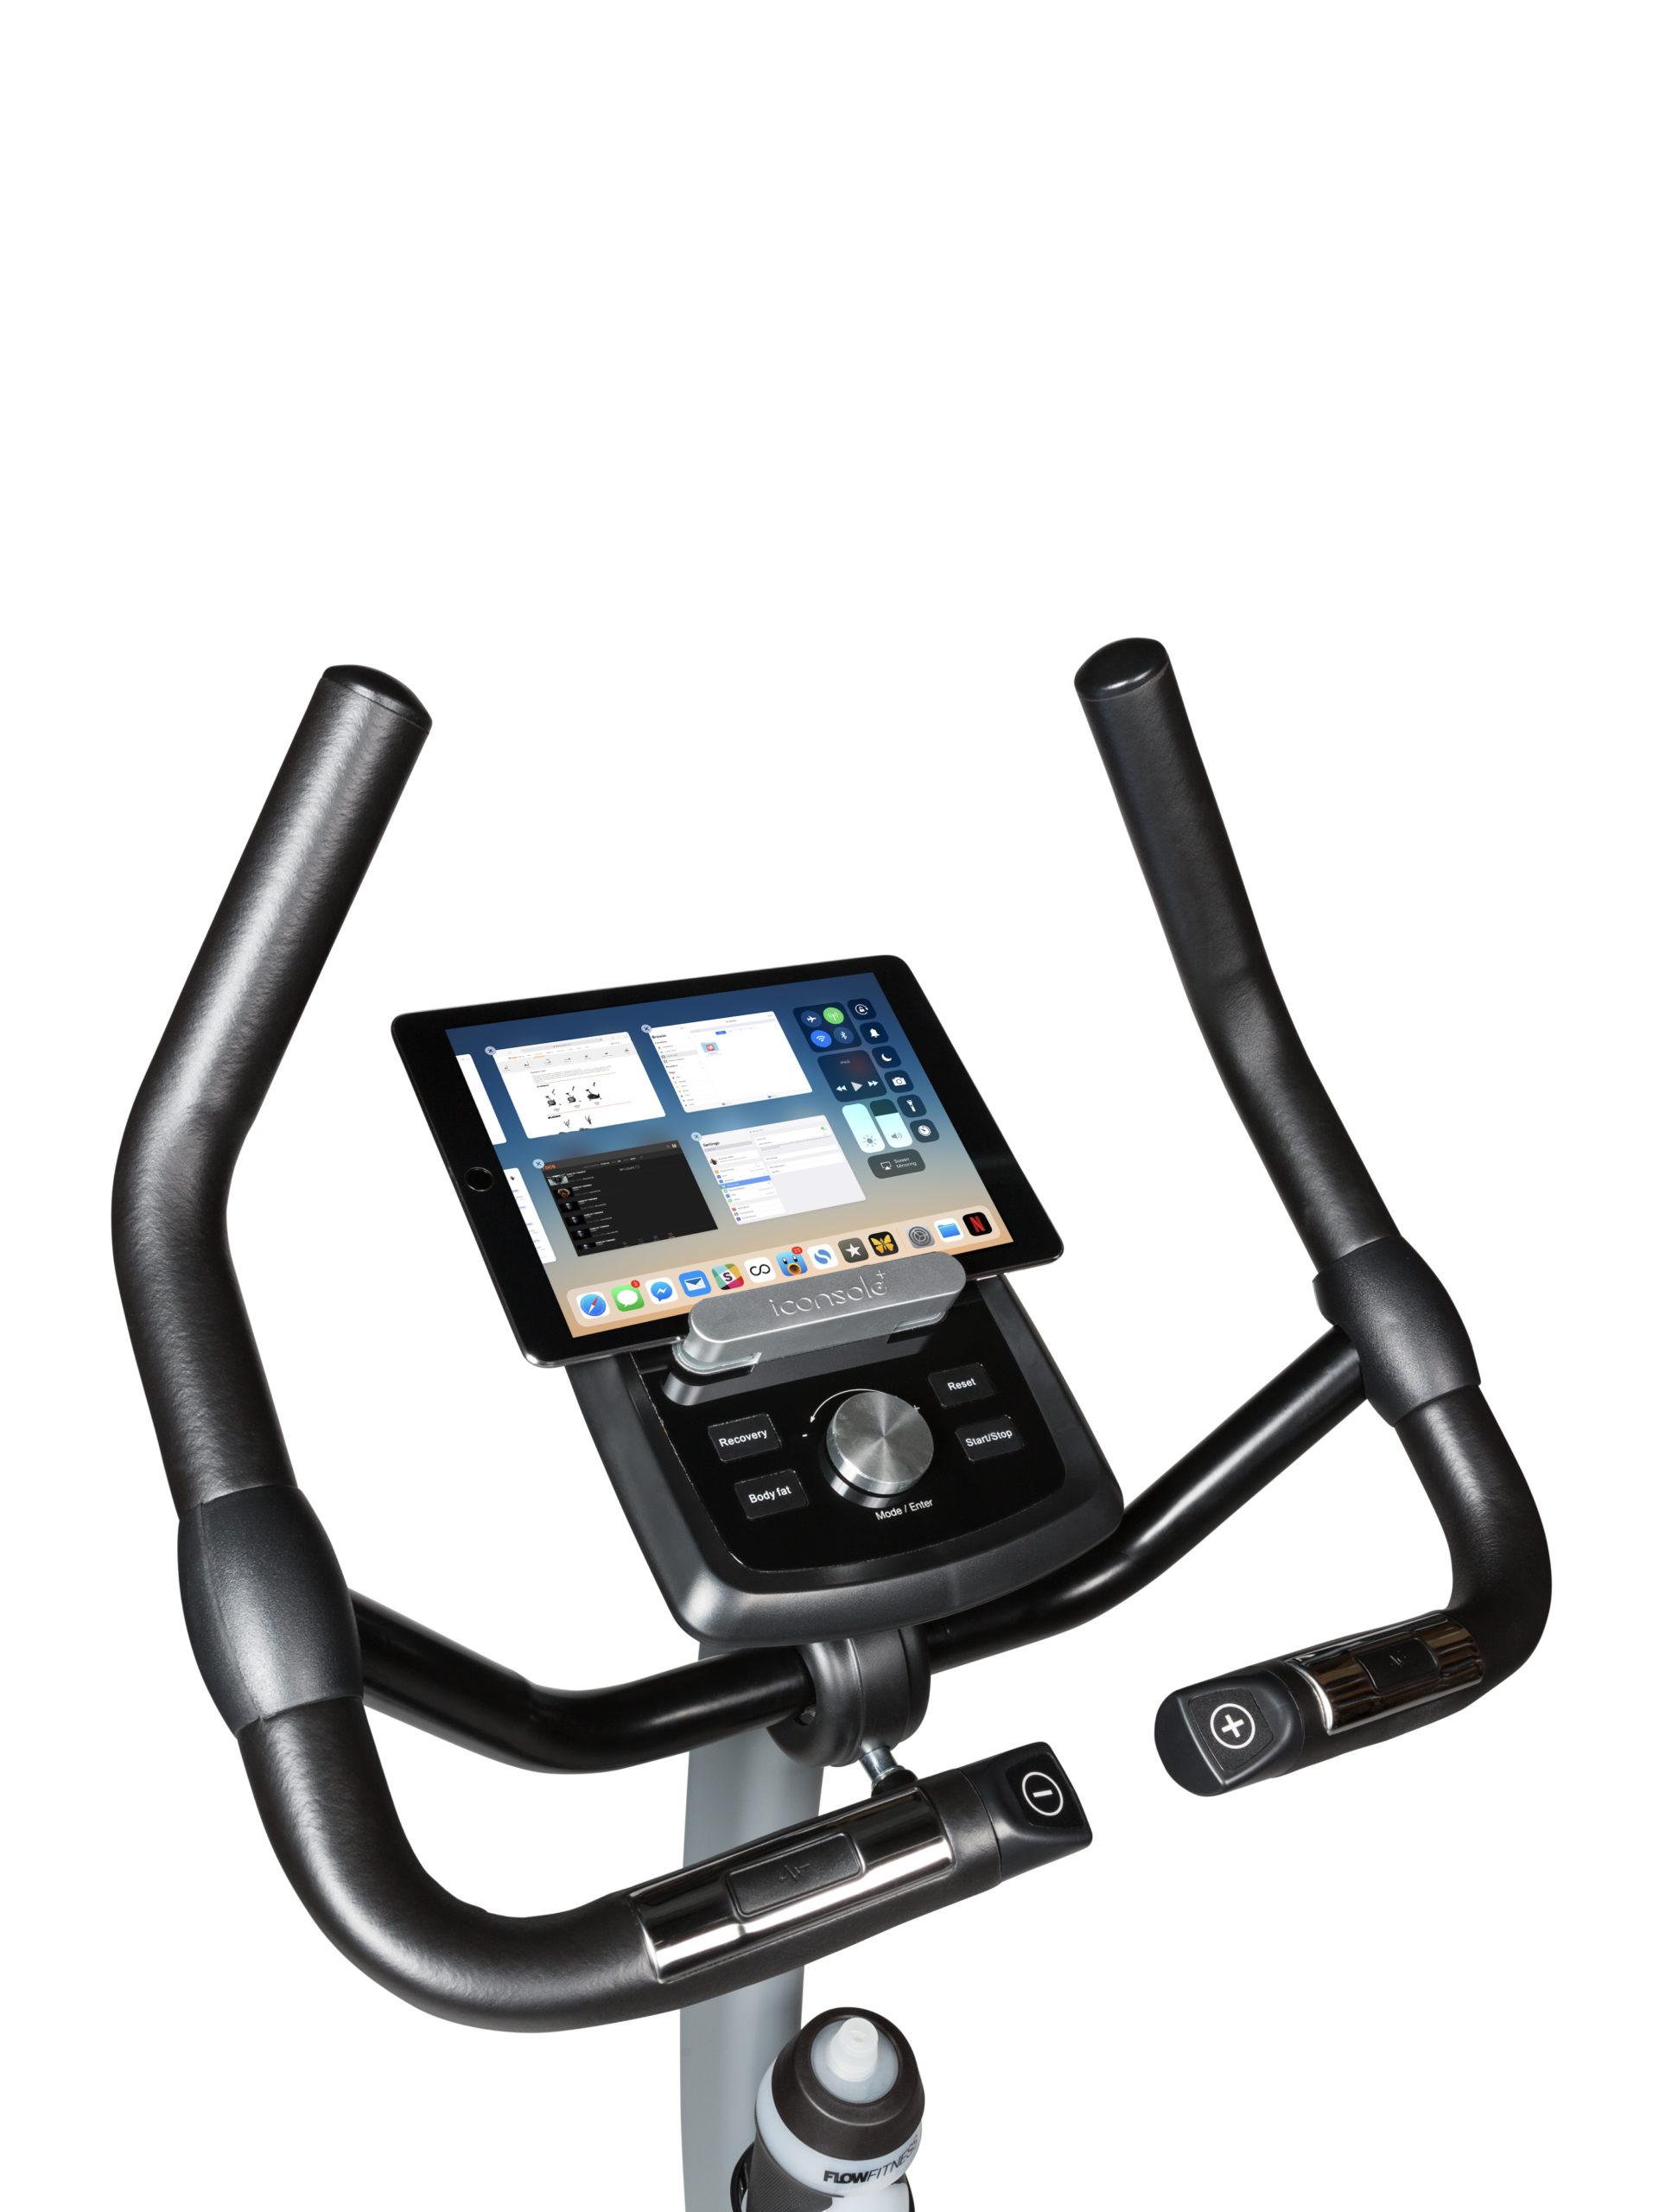 Flow Fitness Tabel Turner DHT2000i Hometrainer 6